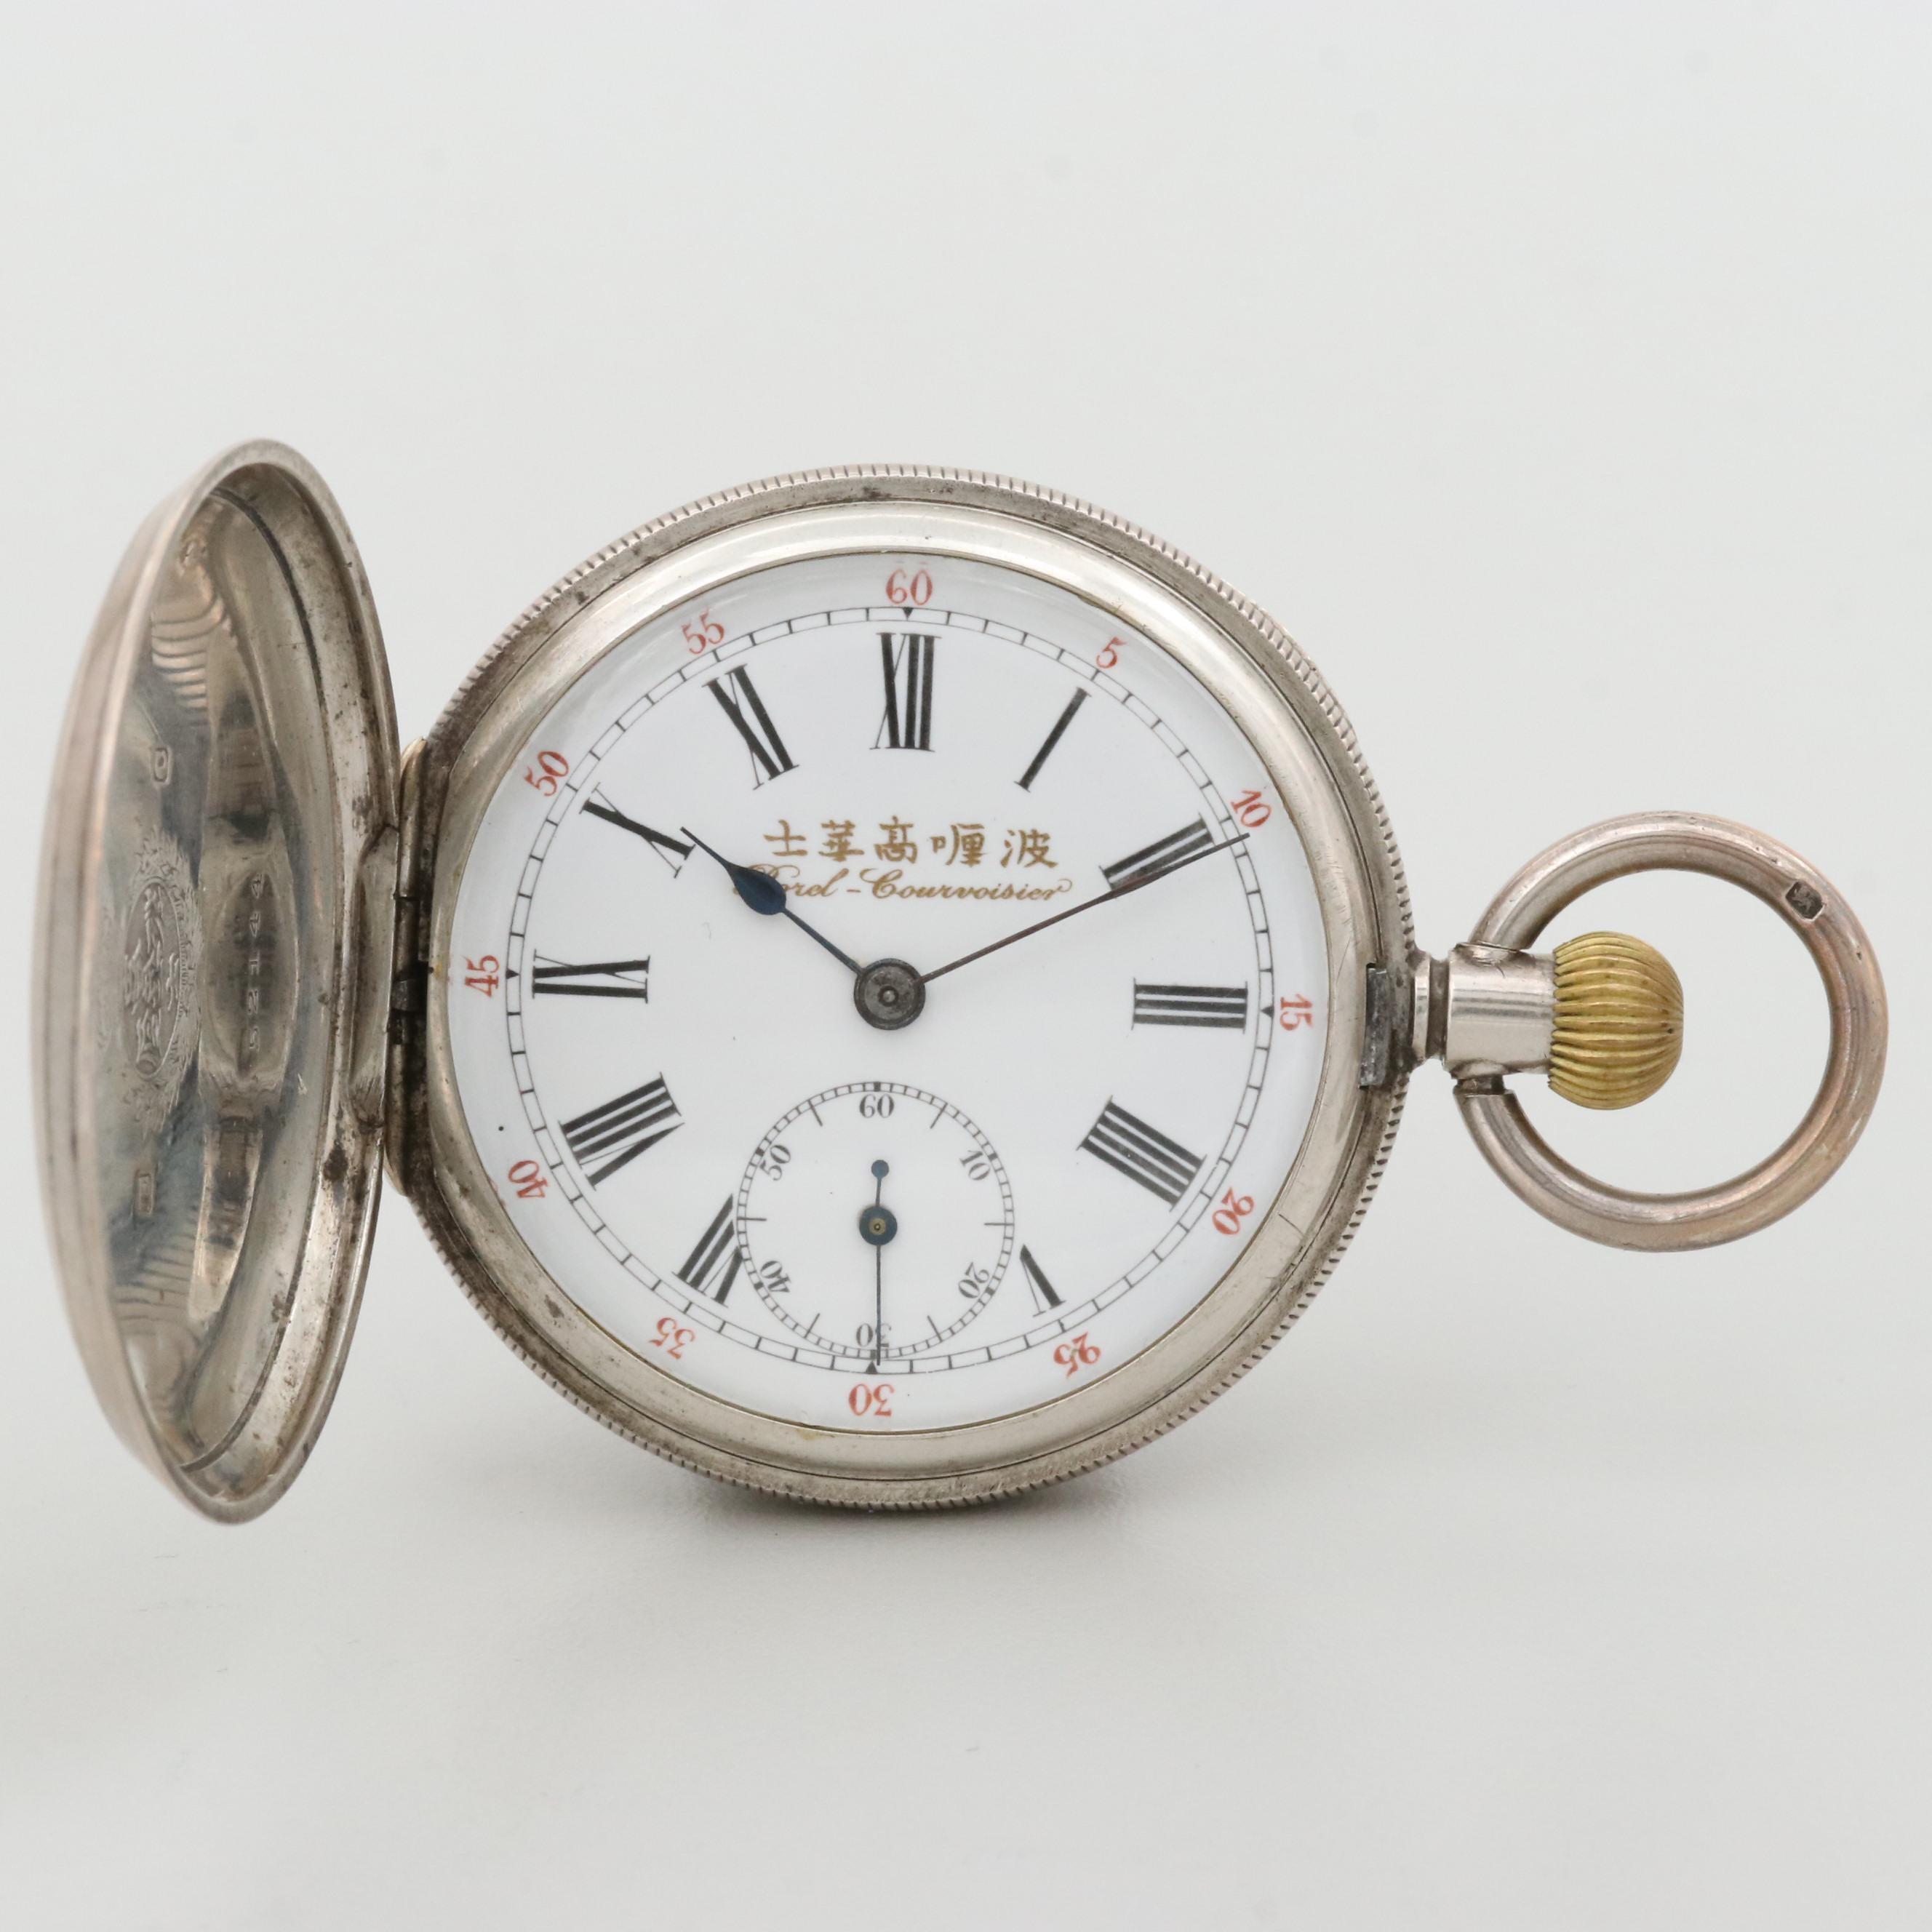 Antique Borel-Courvoisier Sterling Silver Chinese Market Pocket Watch